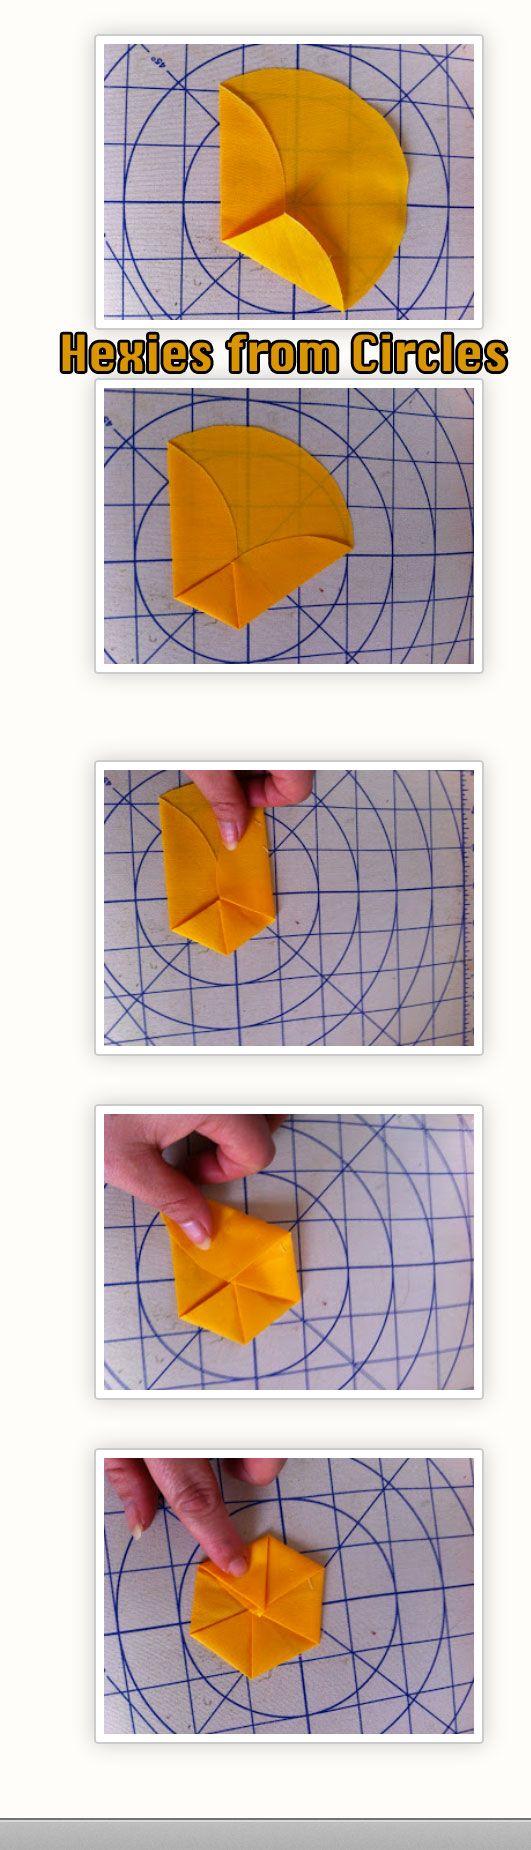 Making Hexagons from Circles http://ucanquilt2.blogspot.com/2013/03/tutorial-for-making-hexagons-from.html